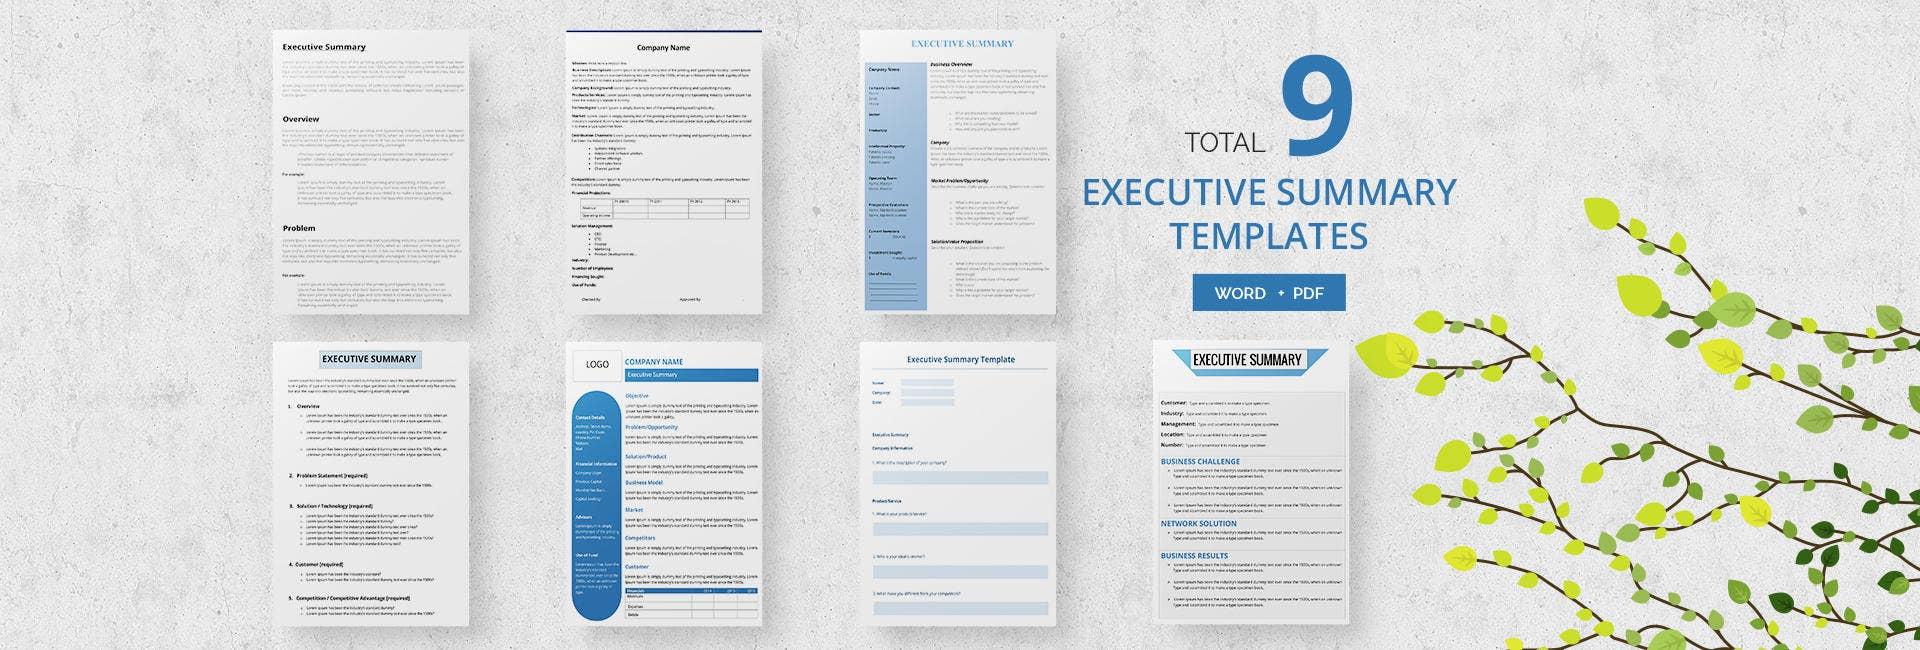 executive_summary_templates_bundle1